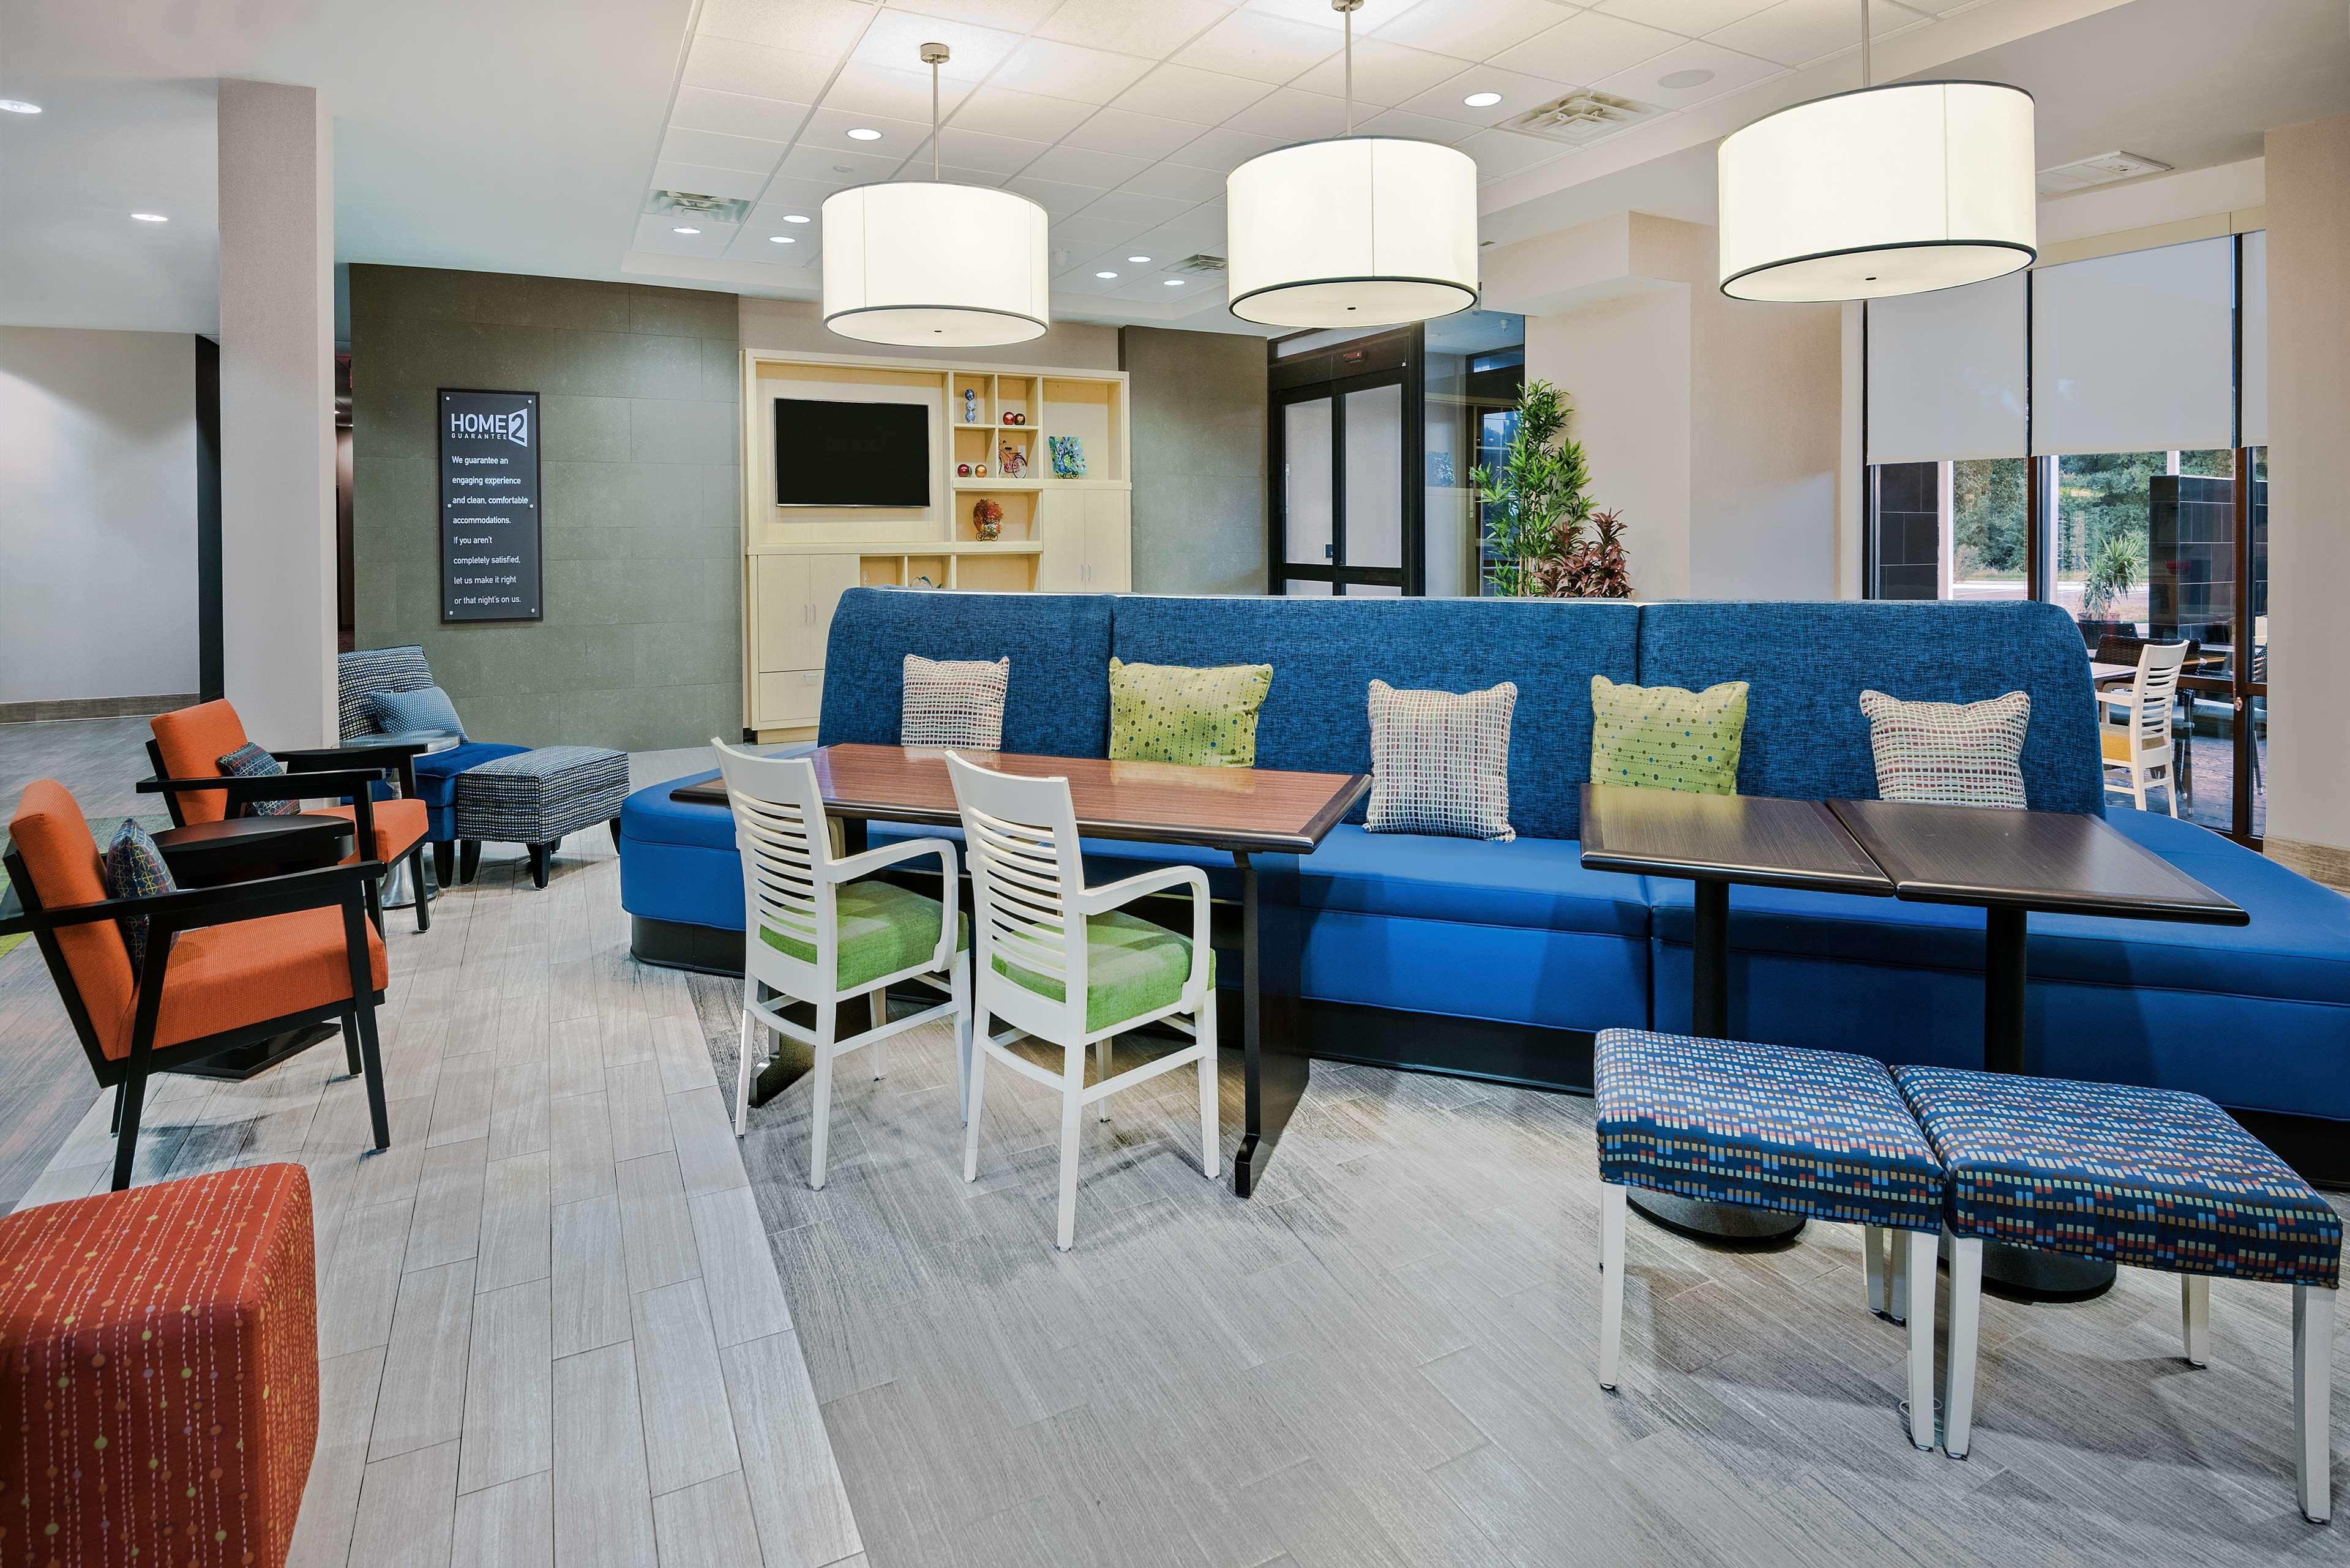 Home2 Suites by Hilton Austin Airport image 7